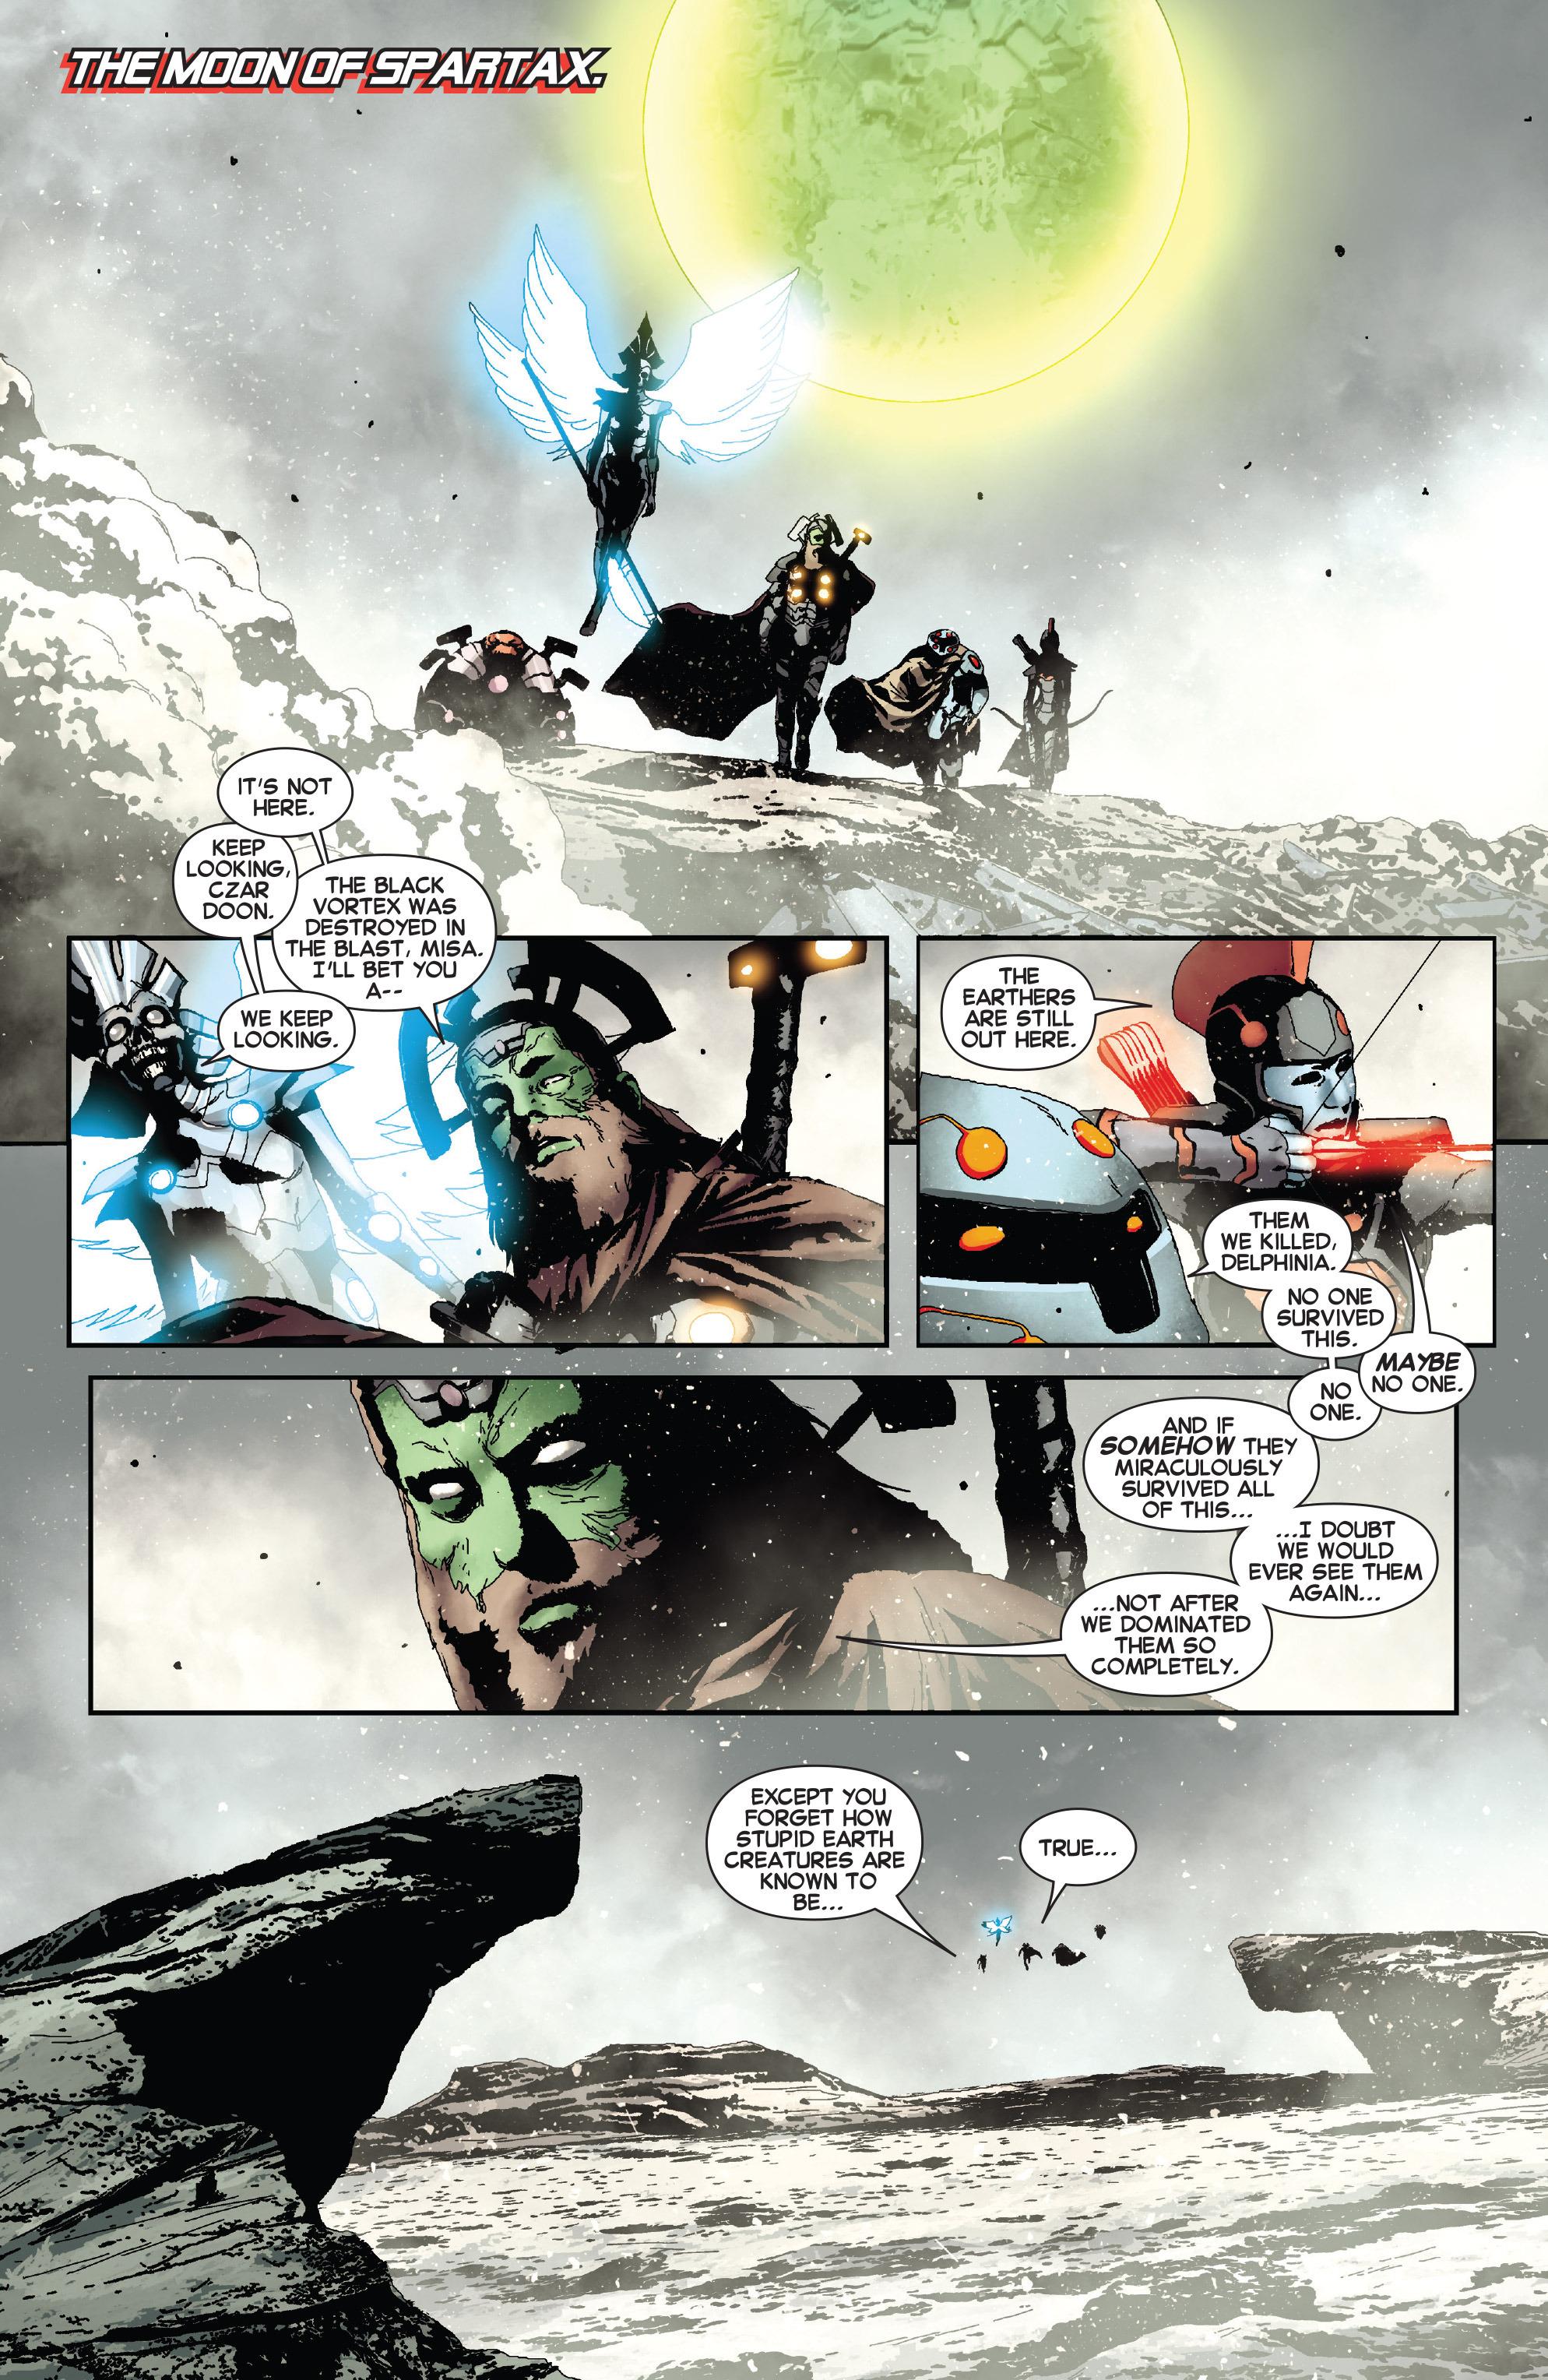 All-New X-Men (2013) chap 39 pic 7